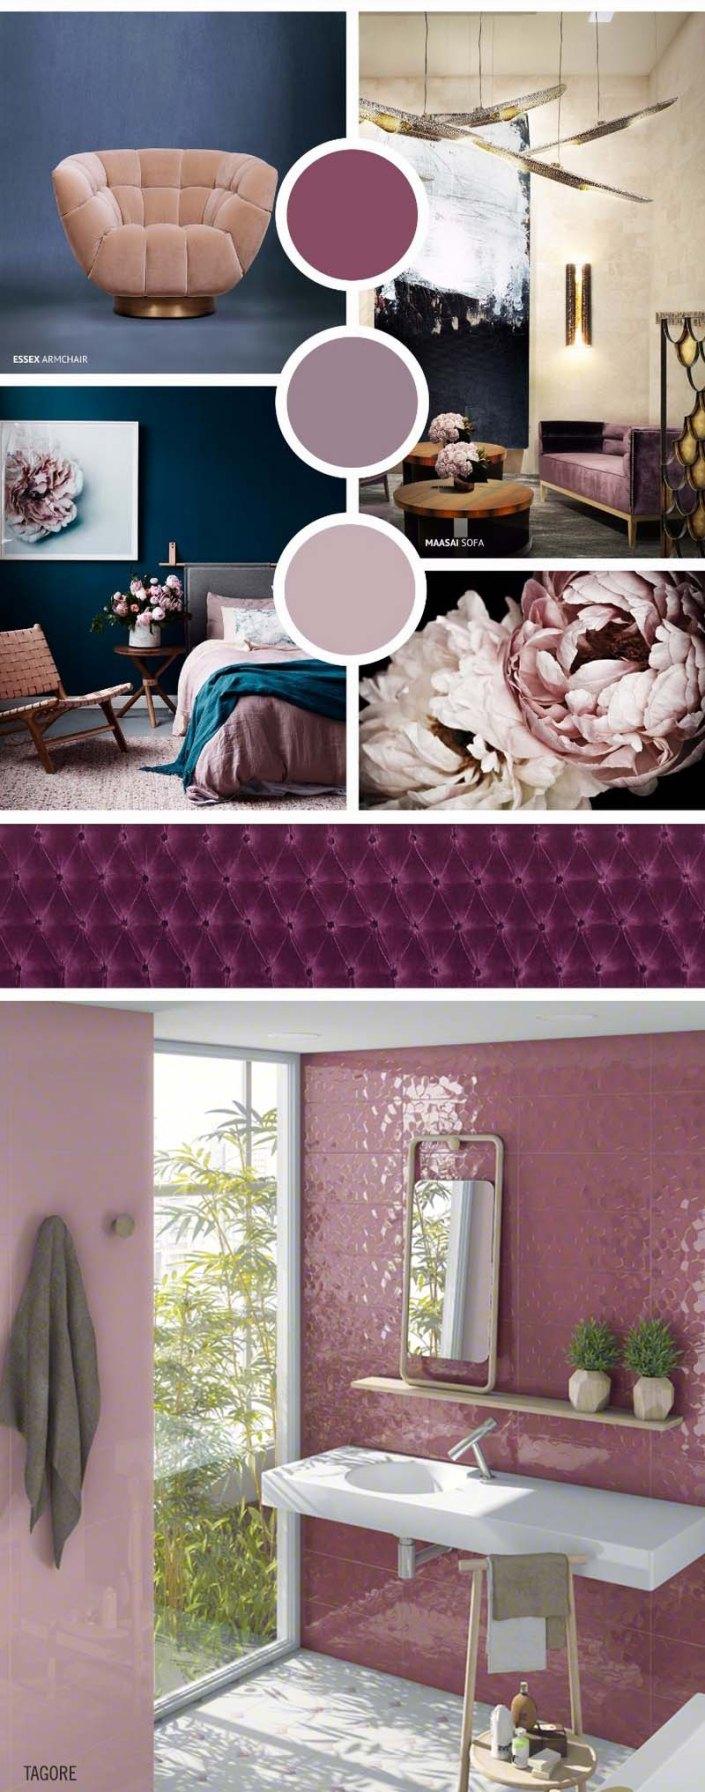 3_Decorate-Your-Interiors-Using-Pantones-2018-Colour-Trends-Predictions-1